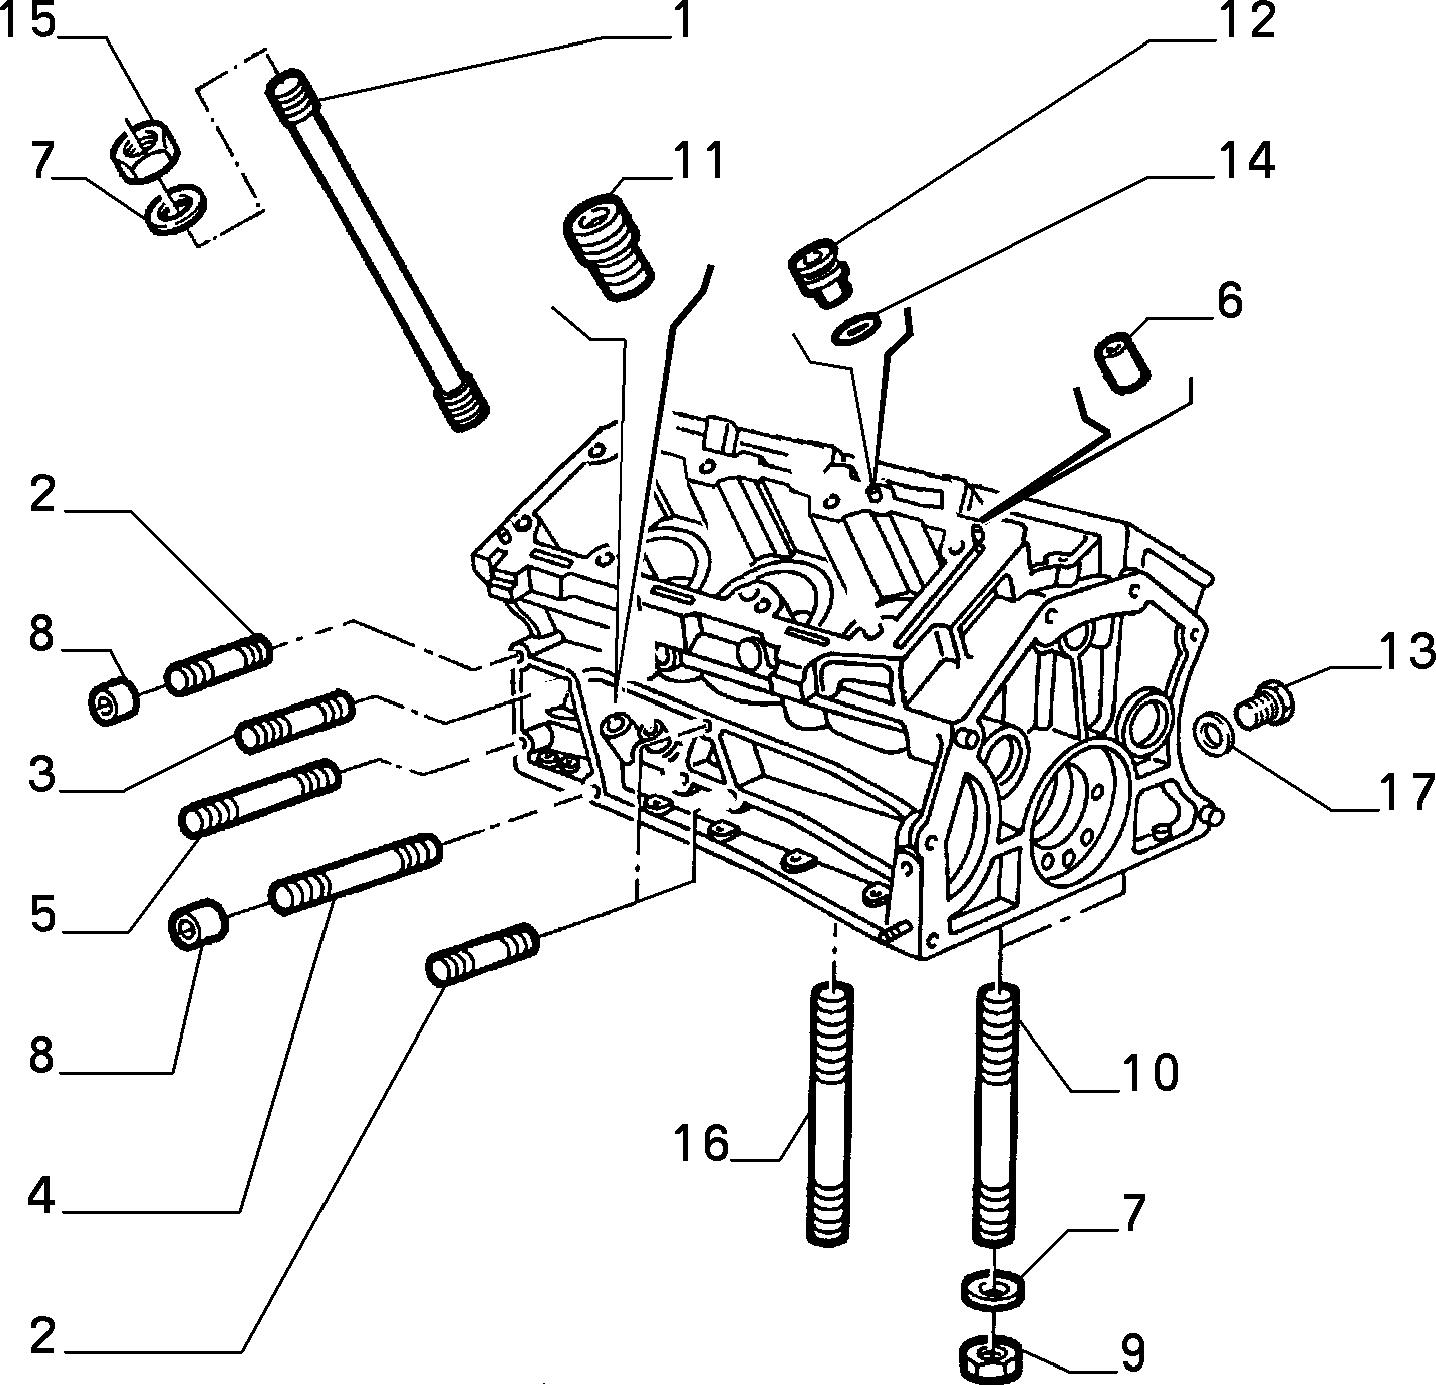 TR_4107 350 Chevy Engine Diagram Wiring Diagram